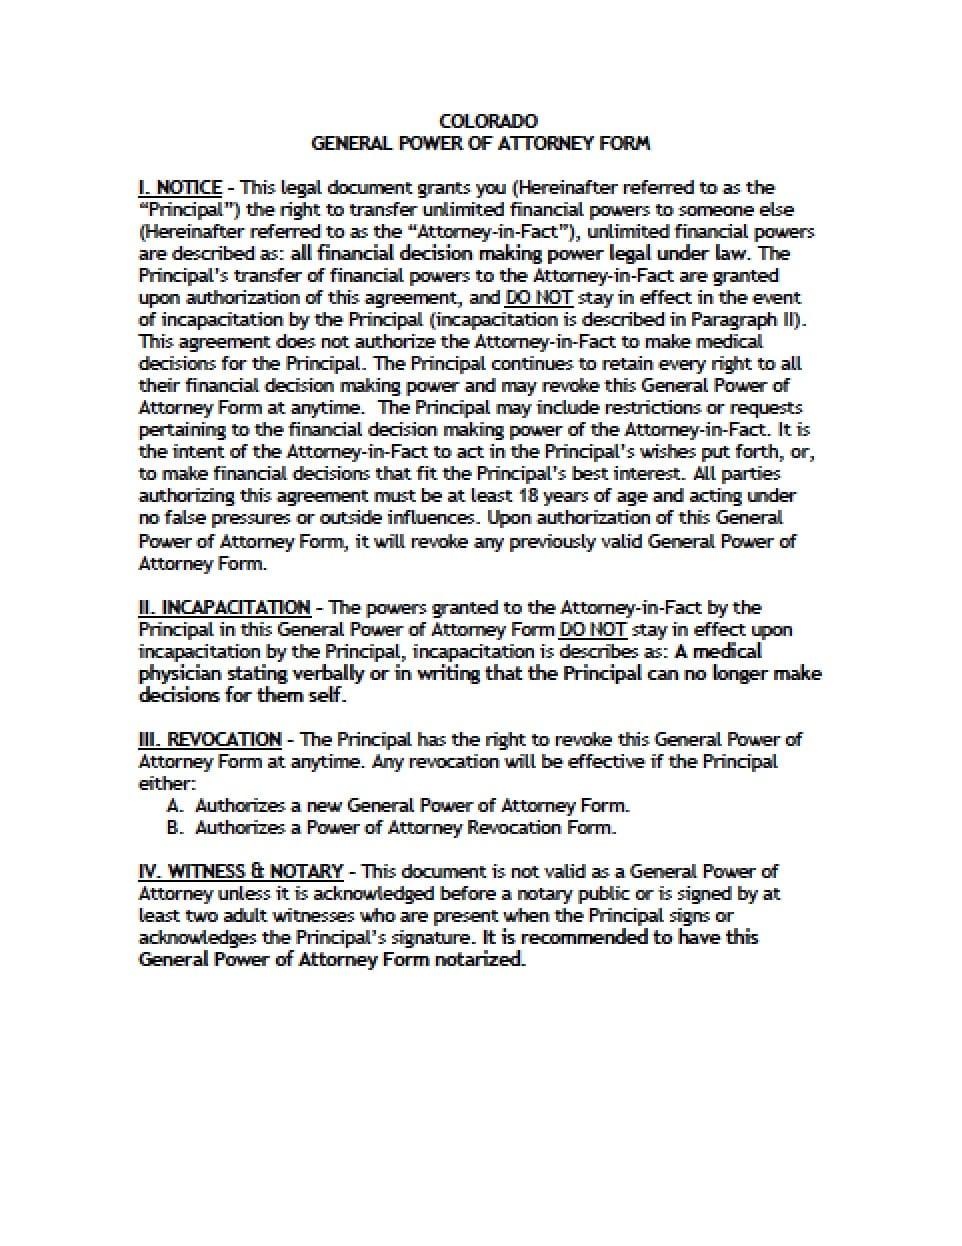 Colorado tax power of attorney form power of attorney power of colorado general financial power of attorney form falaconquin